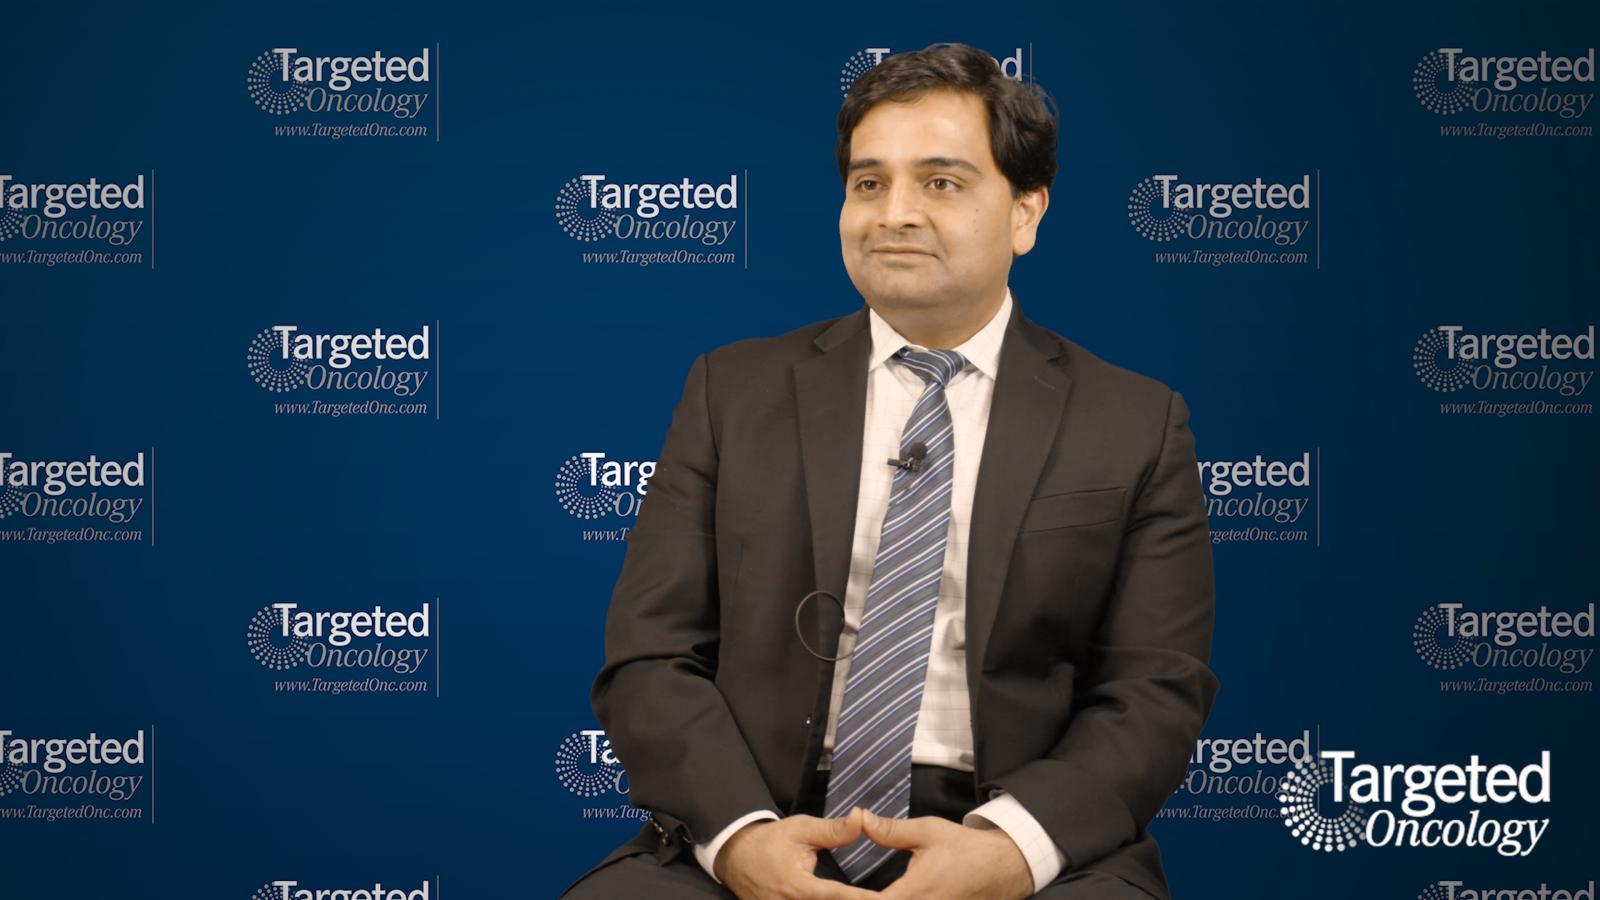 Case-Based Overview: Newly Diagnosed Acute Myeloid Leukemia